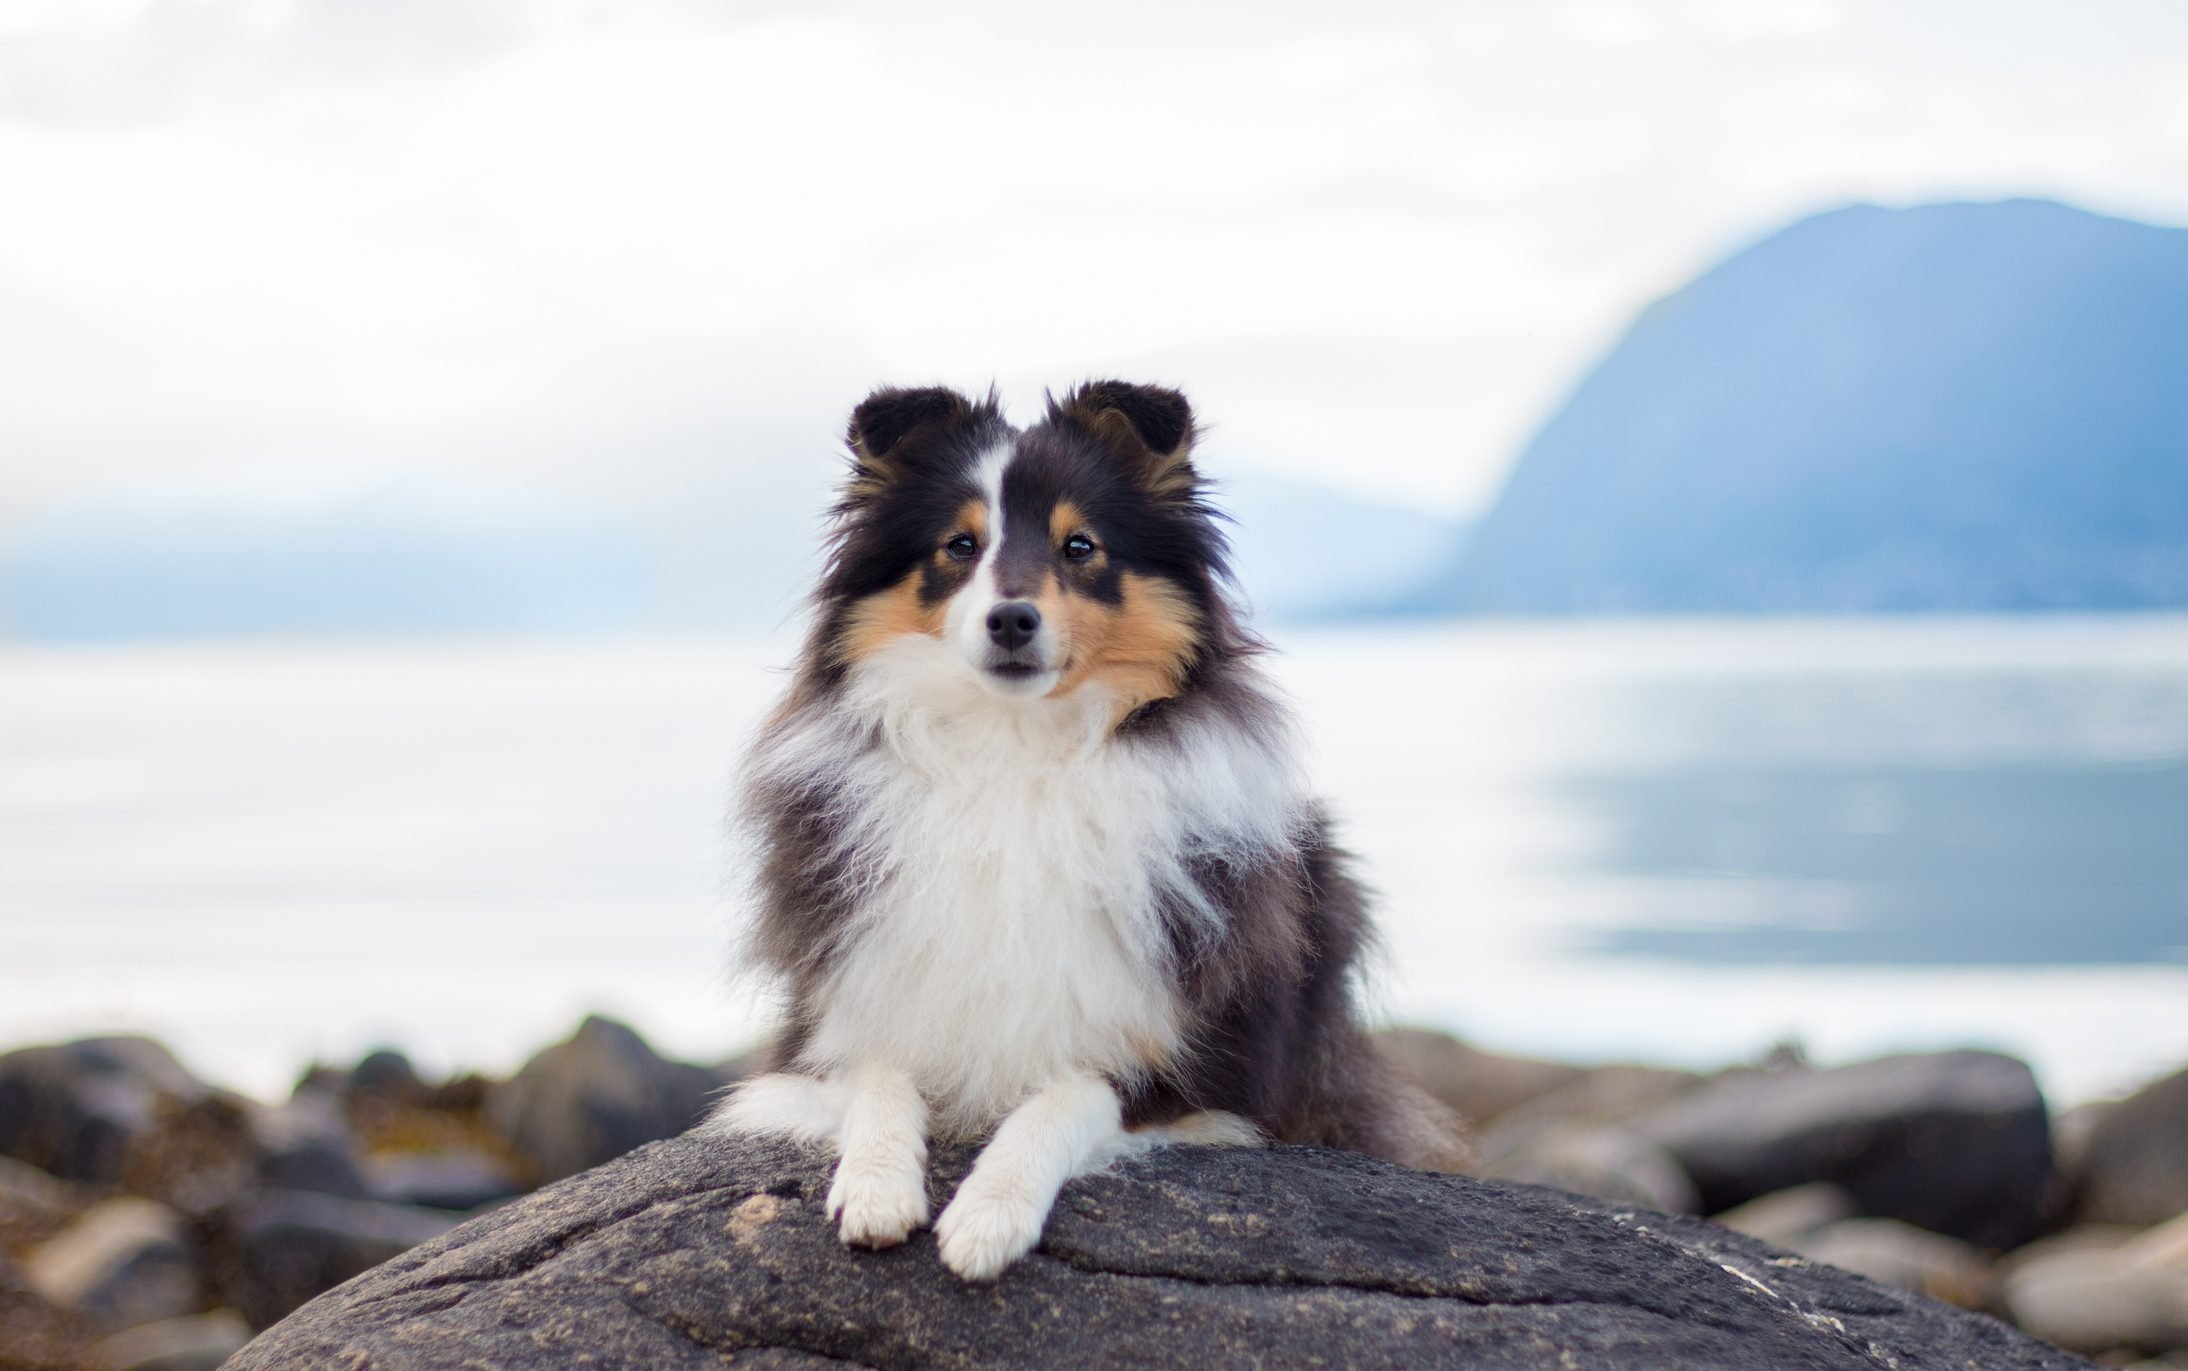 Close up portrait of Shetland sheepdog on beach